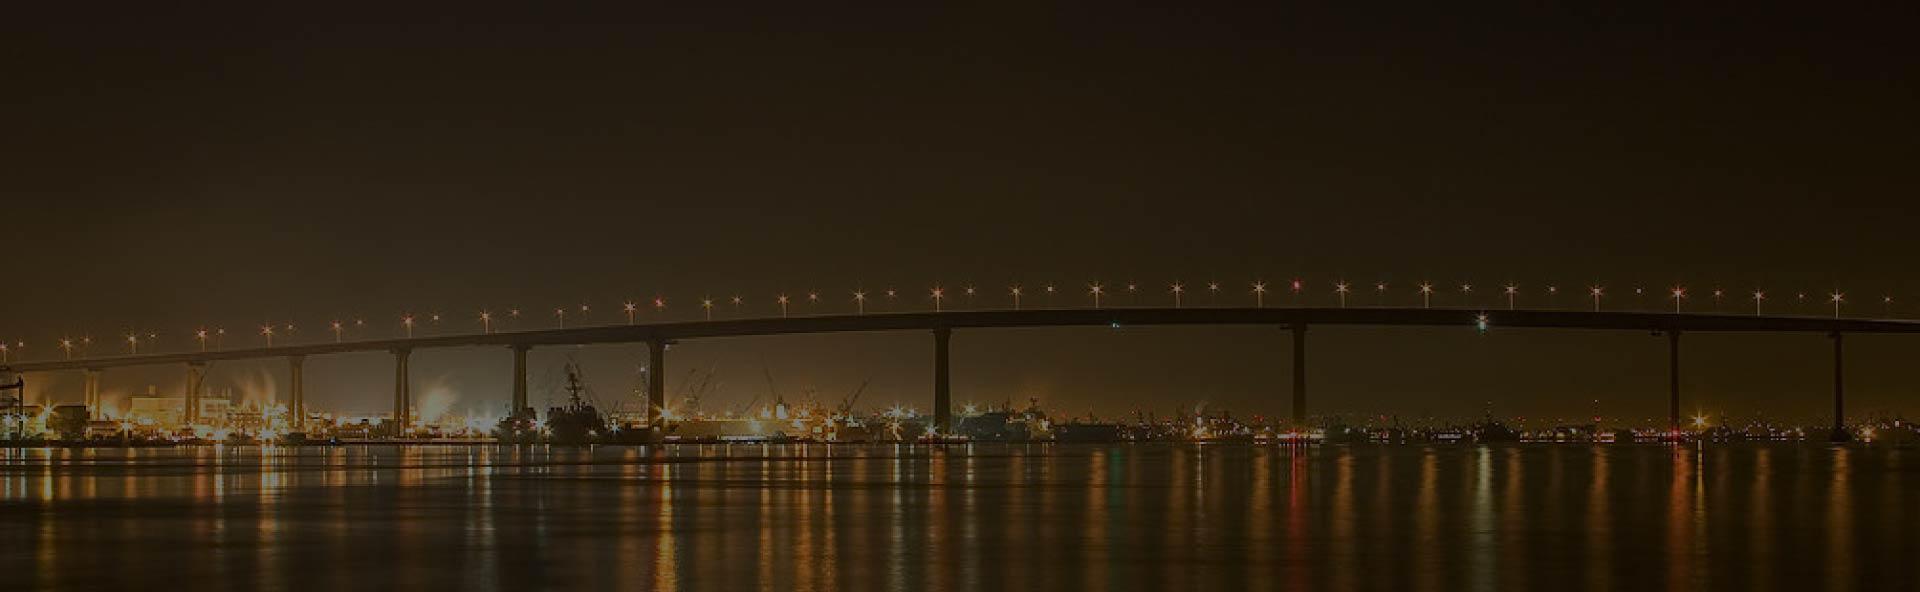 NAHREP San Diego can help YOU build your business